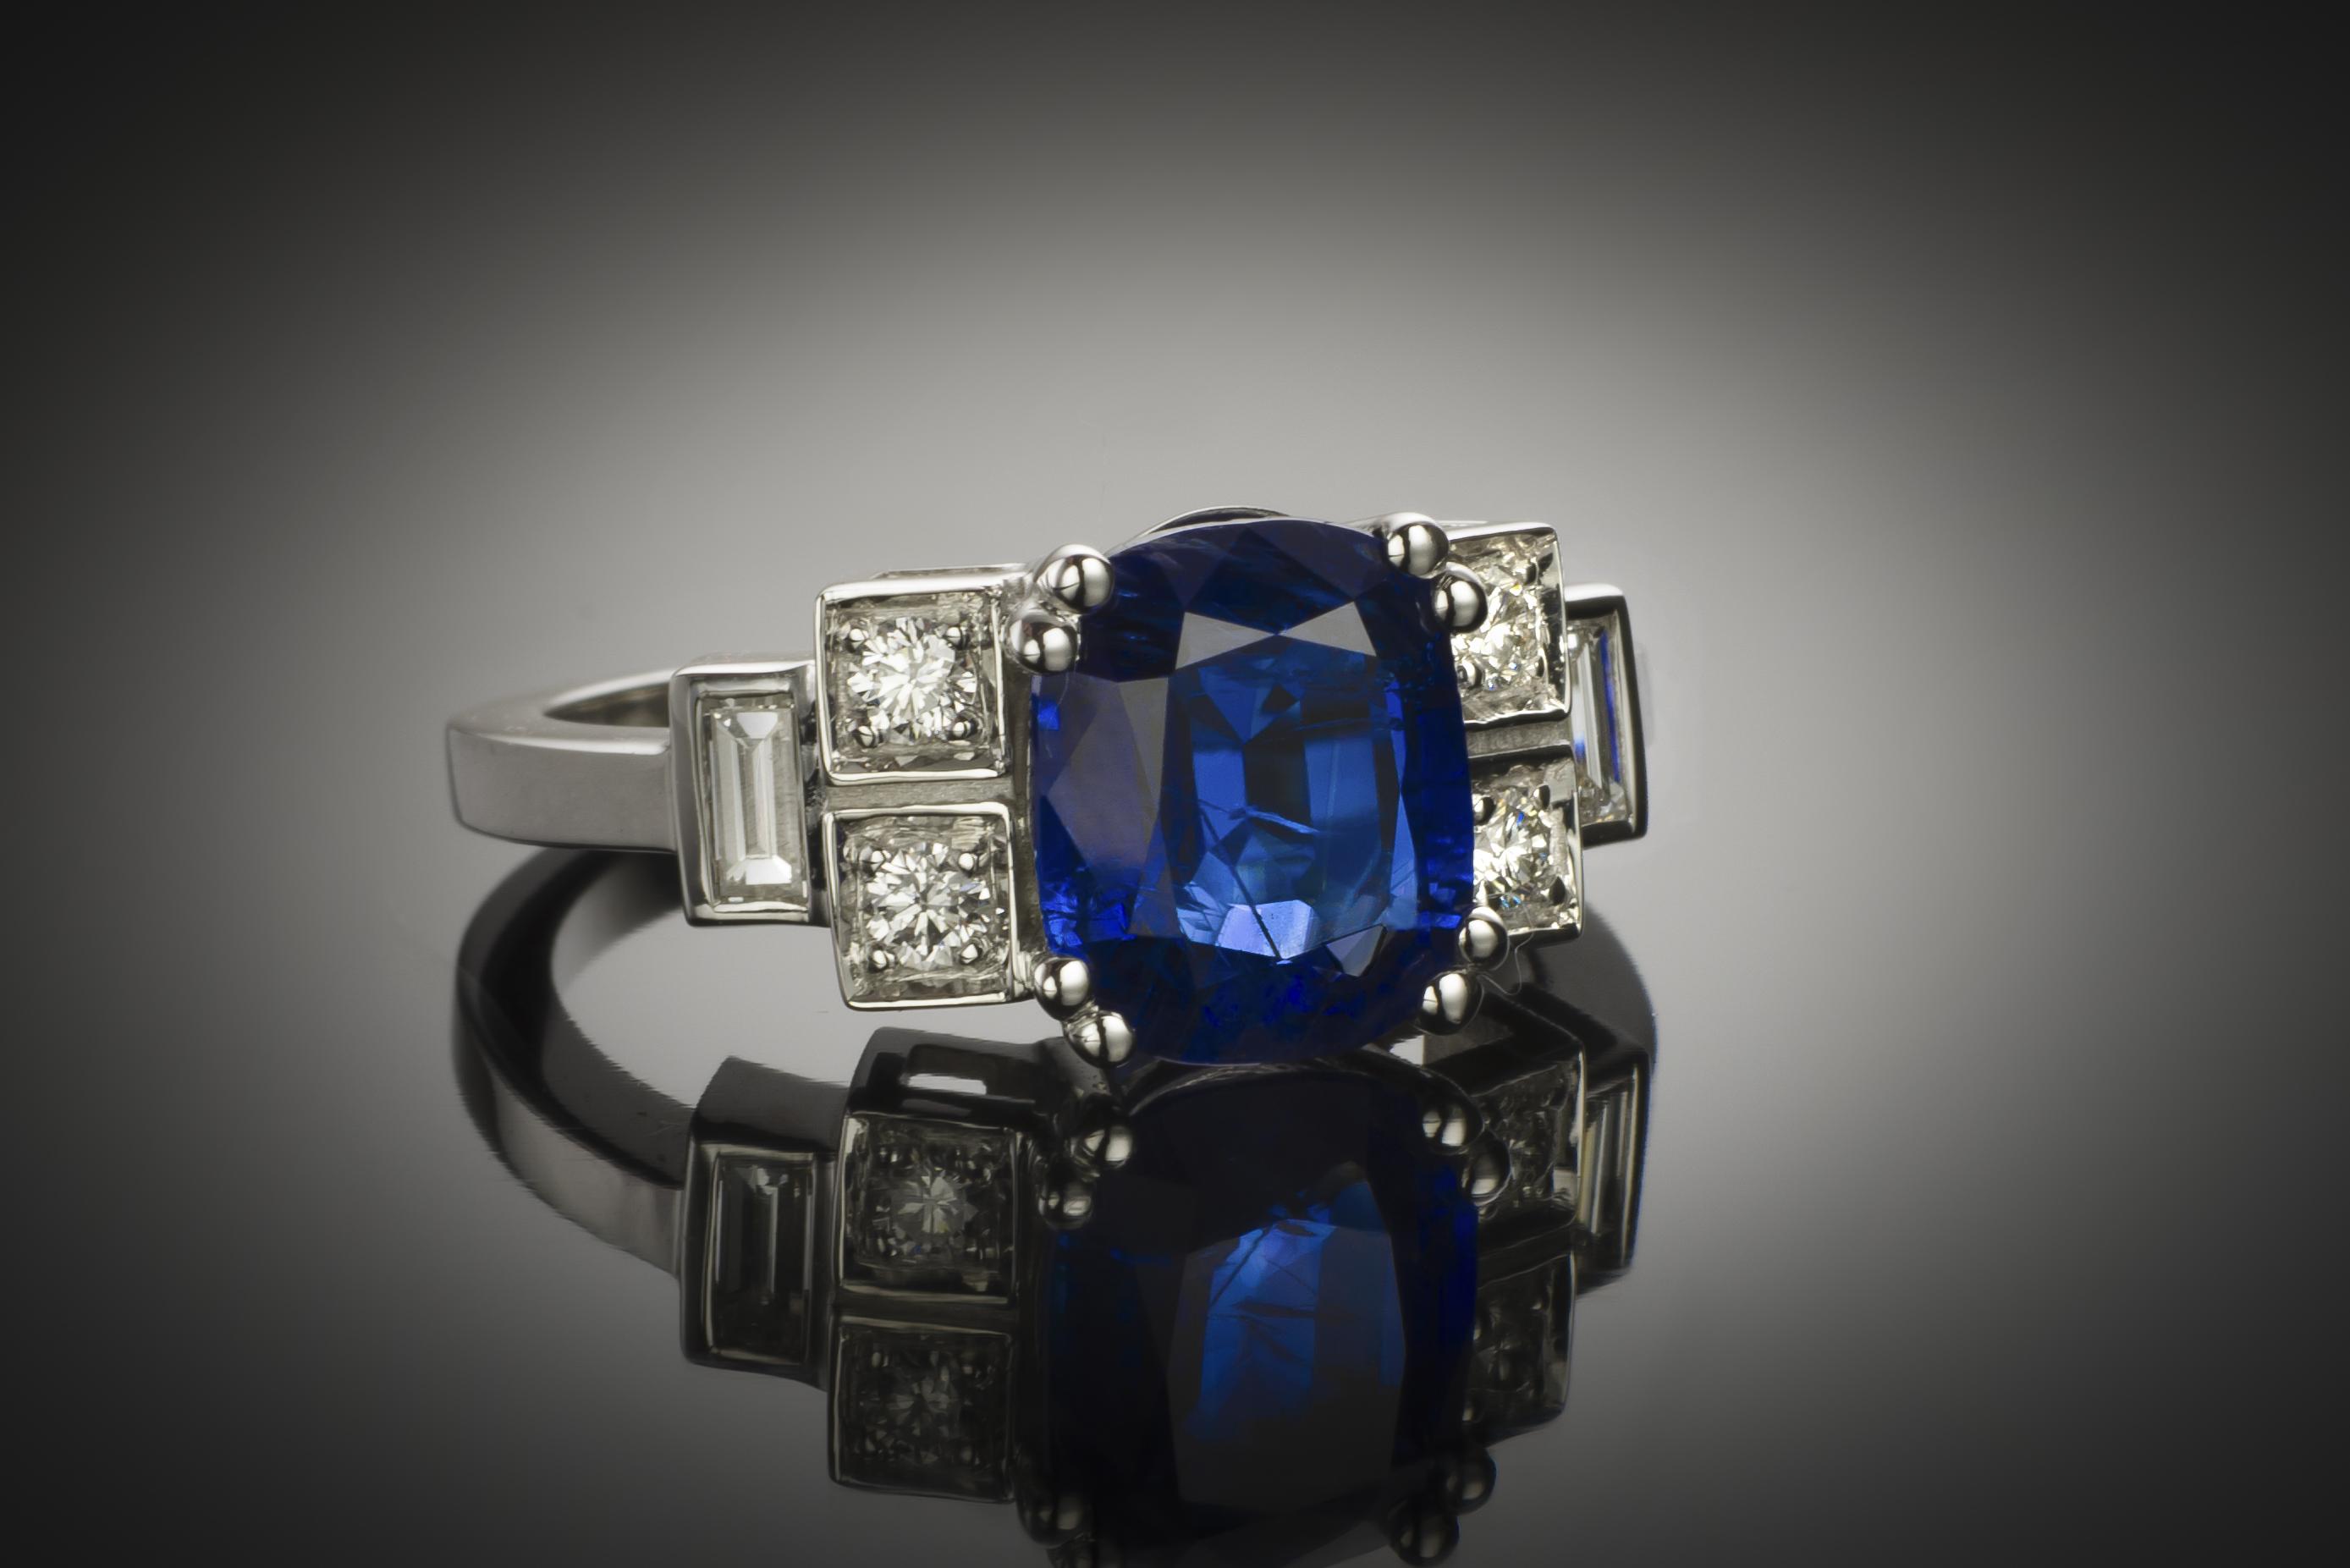 Bague saphir birman naturel coussin (Certificat Gem Paris) diamants-1